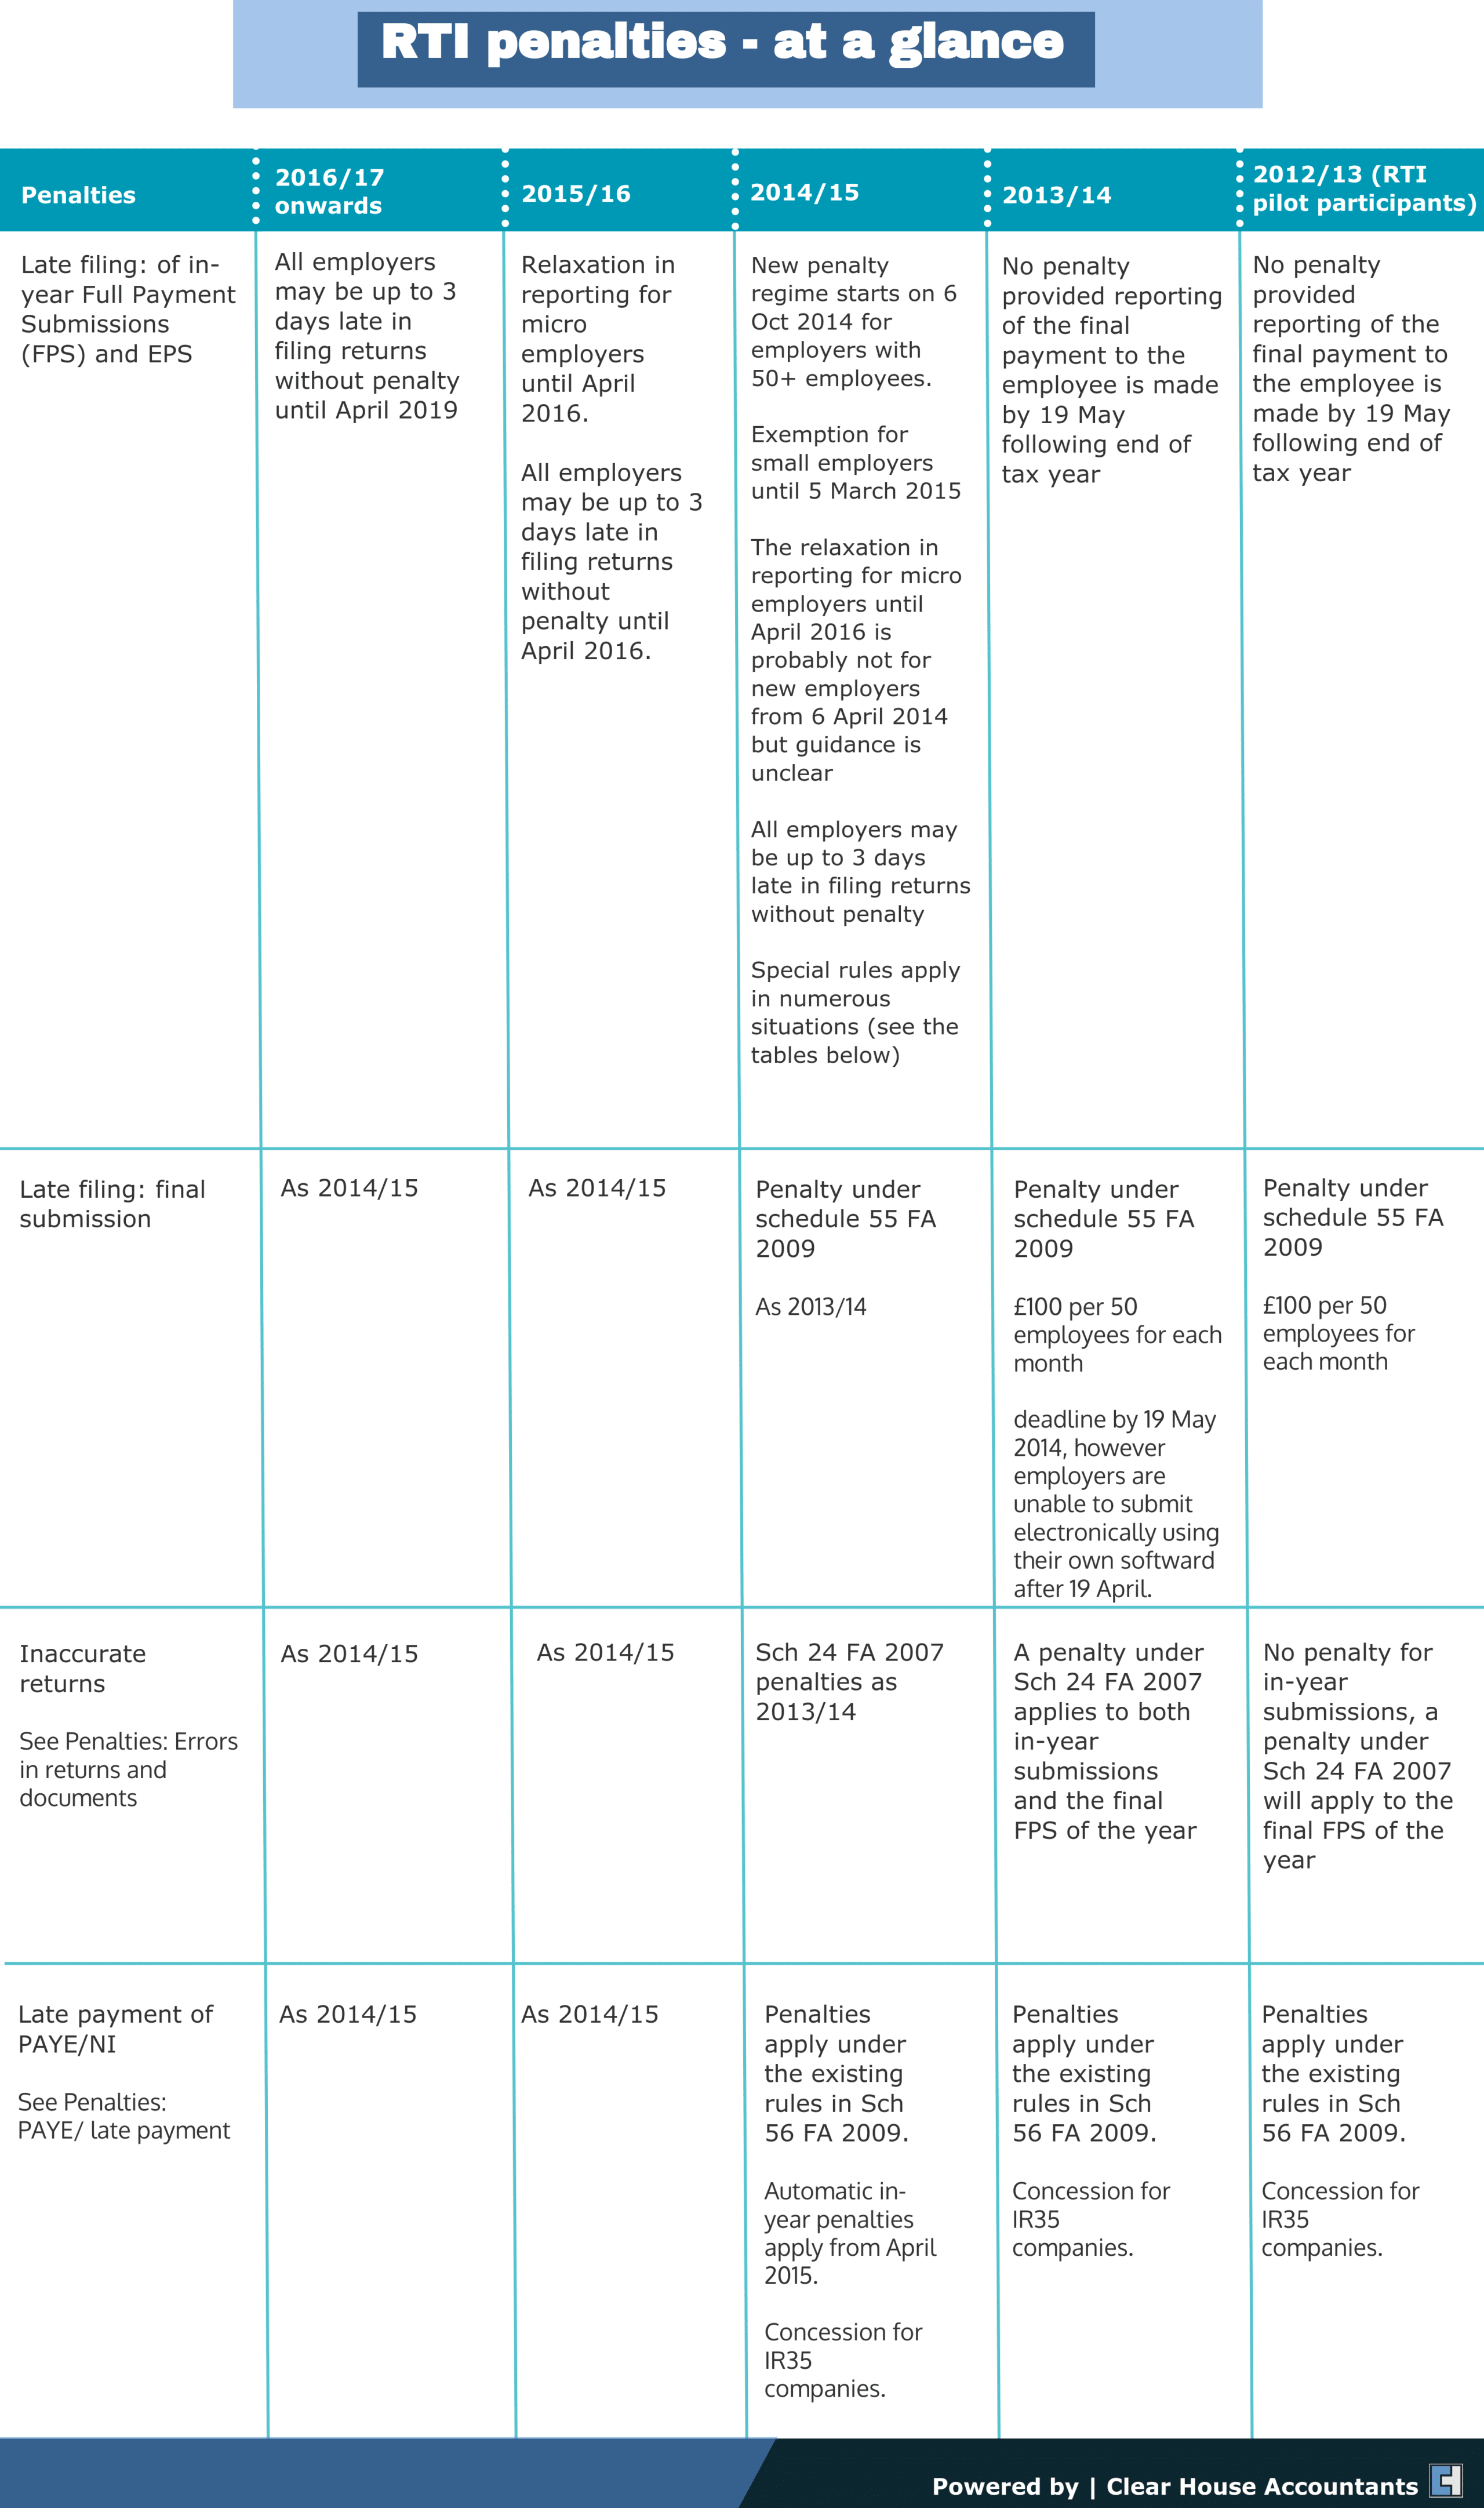 RTI penalties at a glance